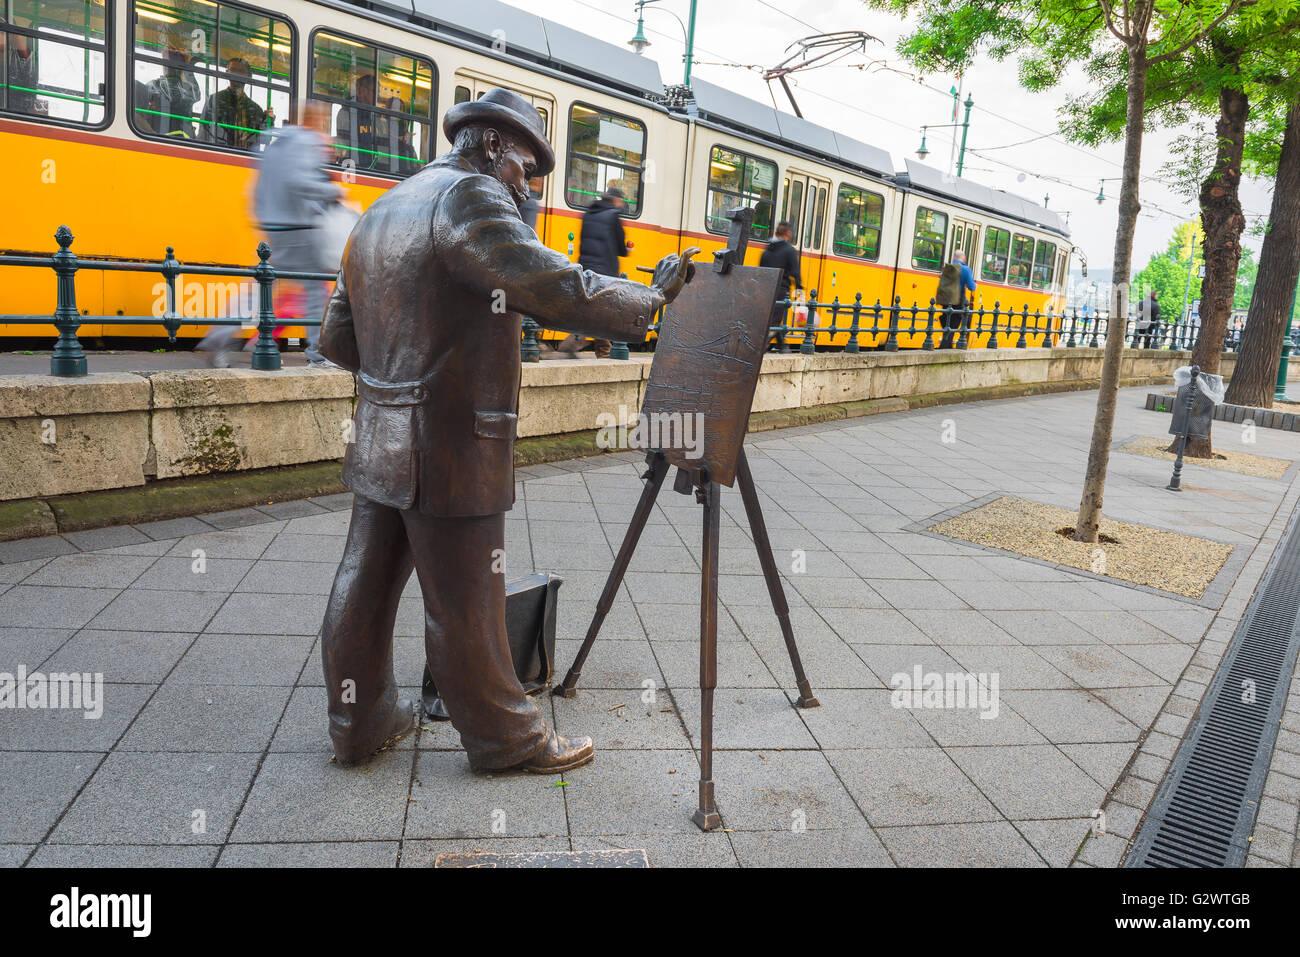 Budapest Belvaros, statue of the Hungarian artist Roskovics Ignac (Festo) sited along the embankment in the Belvaros - Stock Image